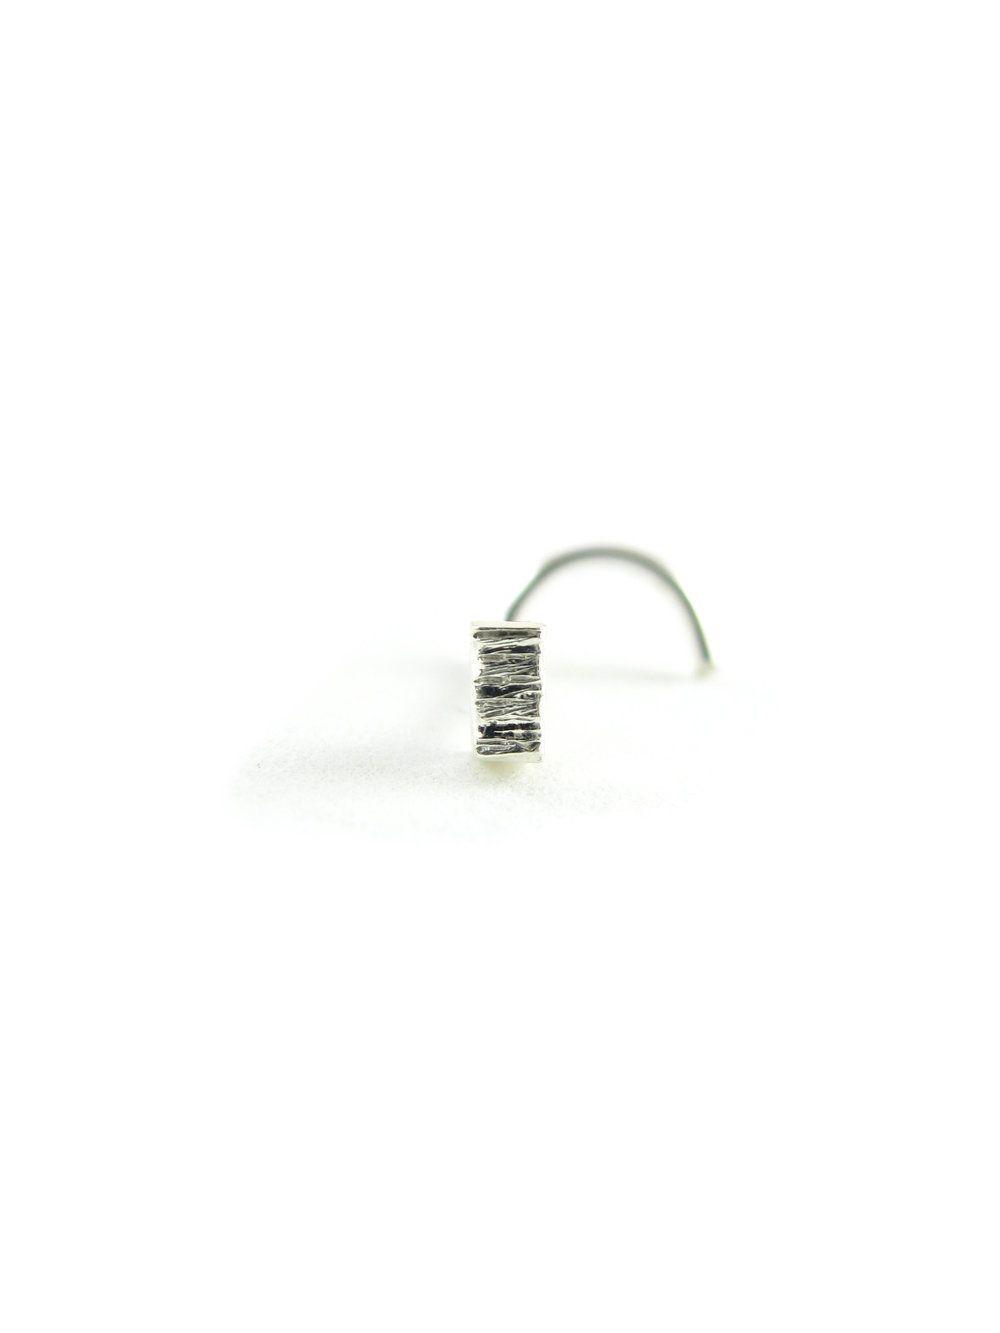 Corkscrew nose piercing  Bar nose stud  recycled platinum  Badass Closure and Unique